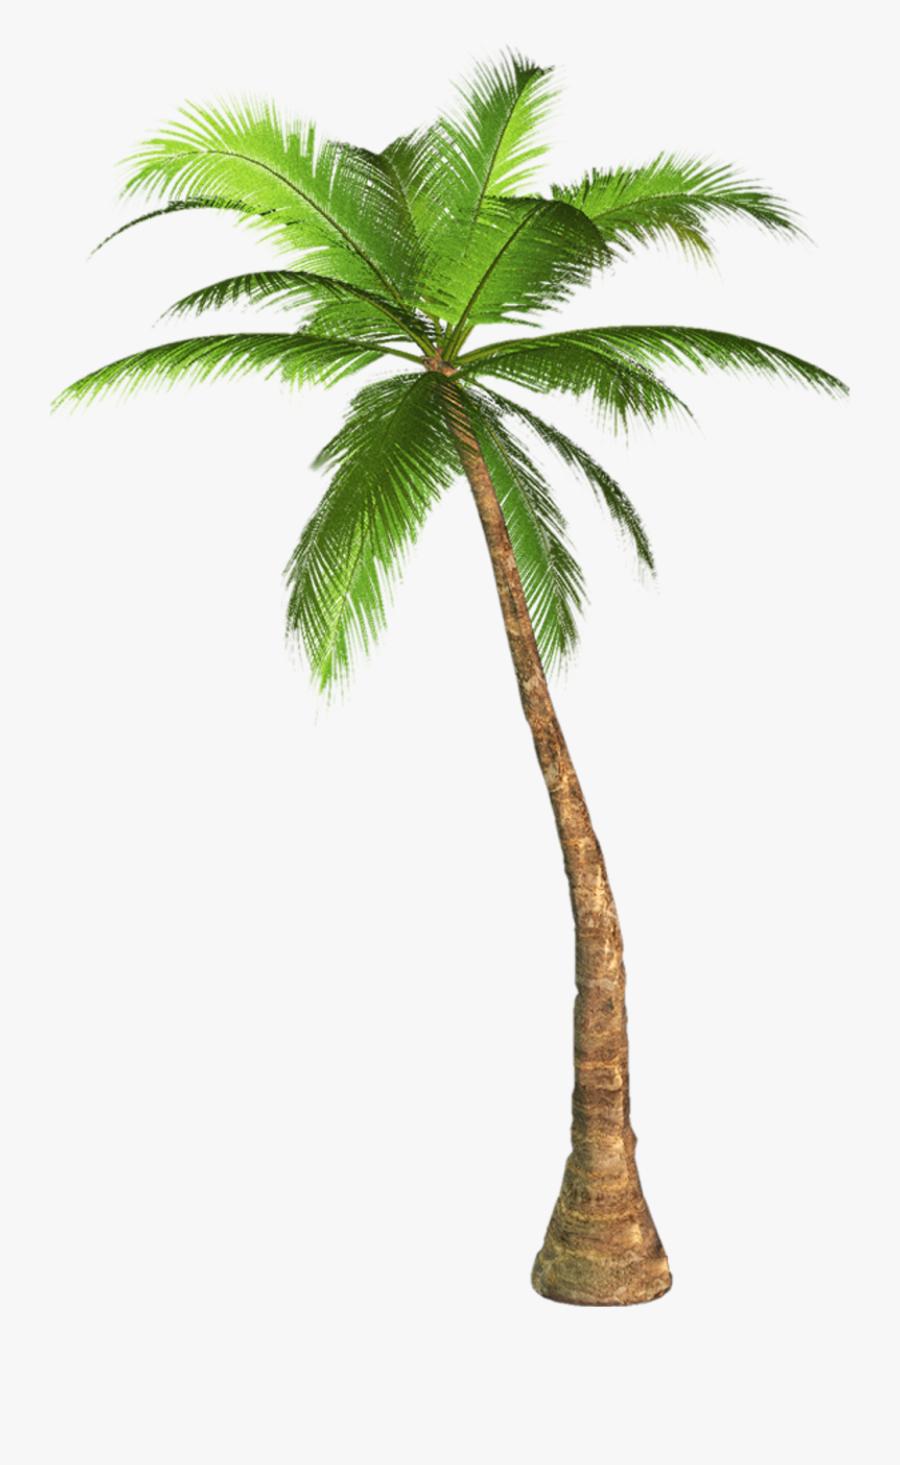 Arecaceae Tree Clip Art - Palm Tree Transparent Background, Transparent Clipart